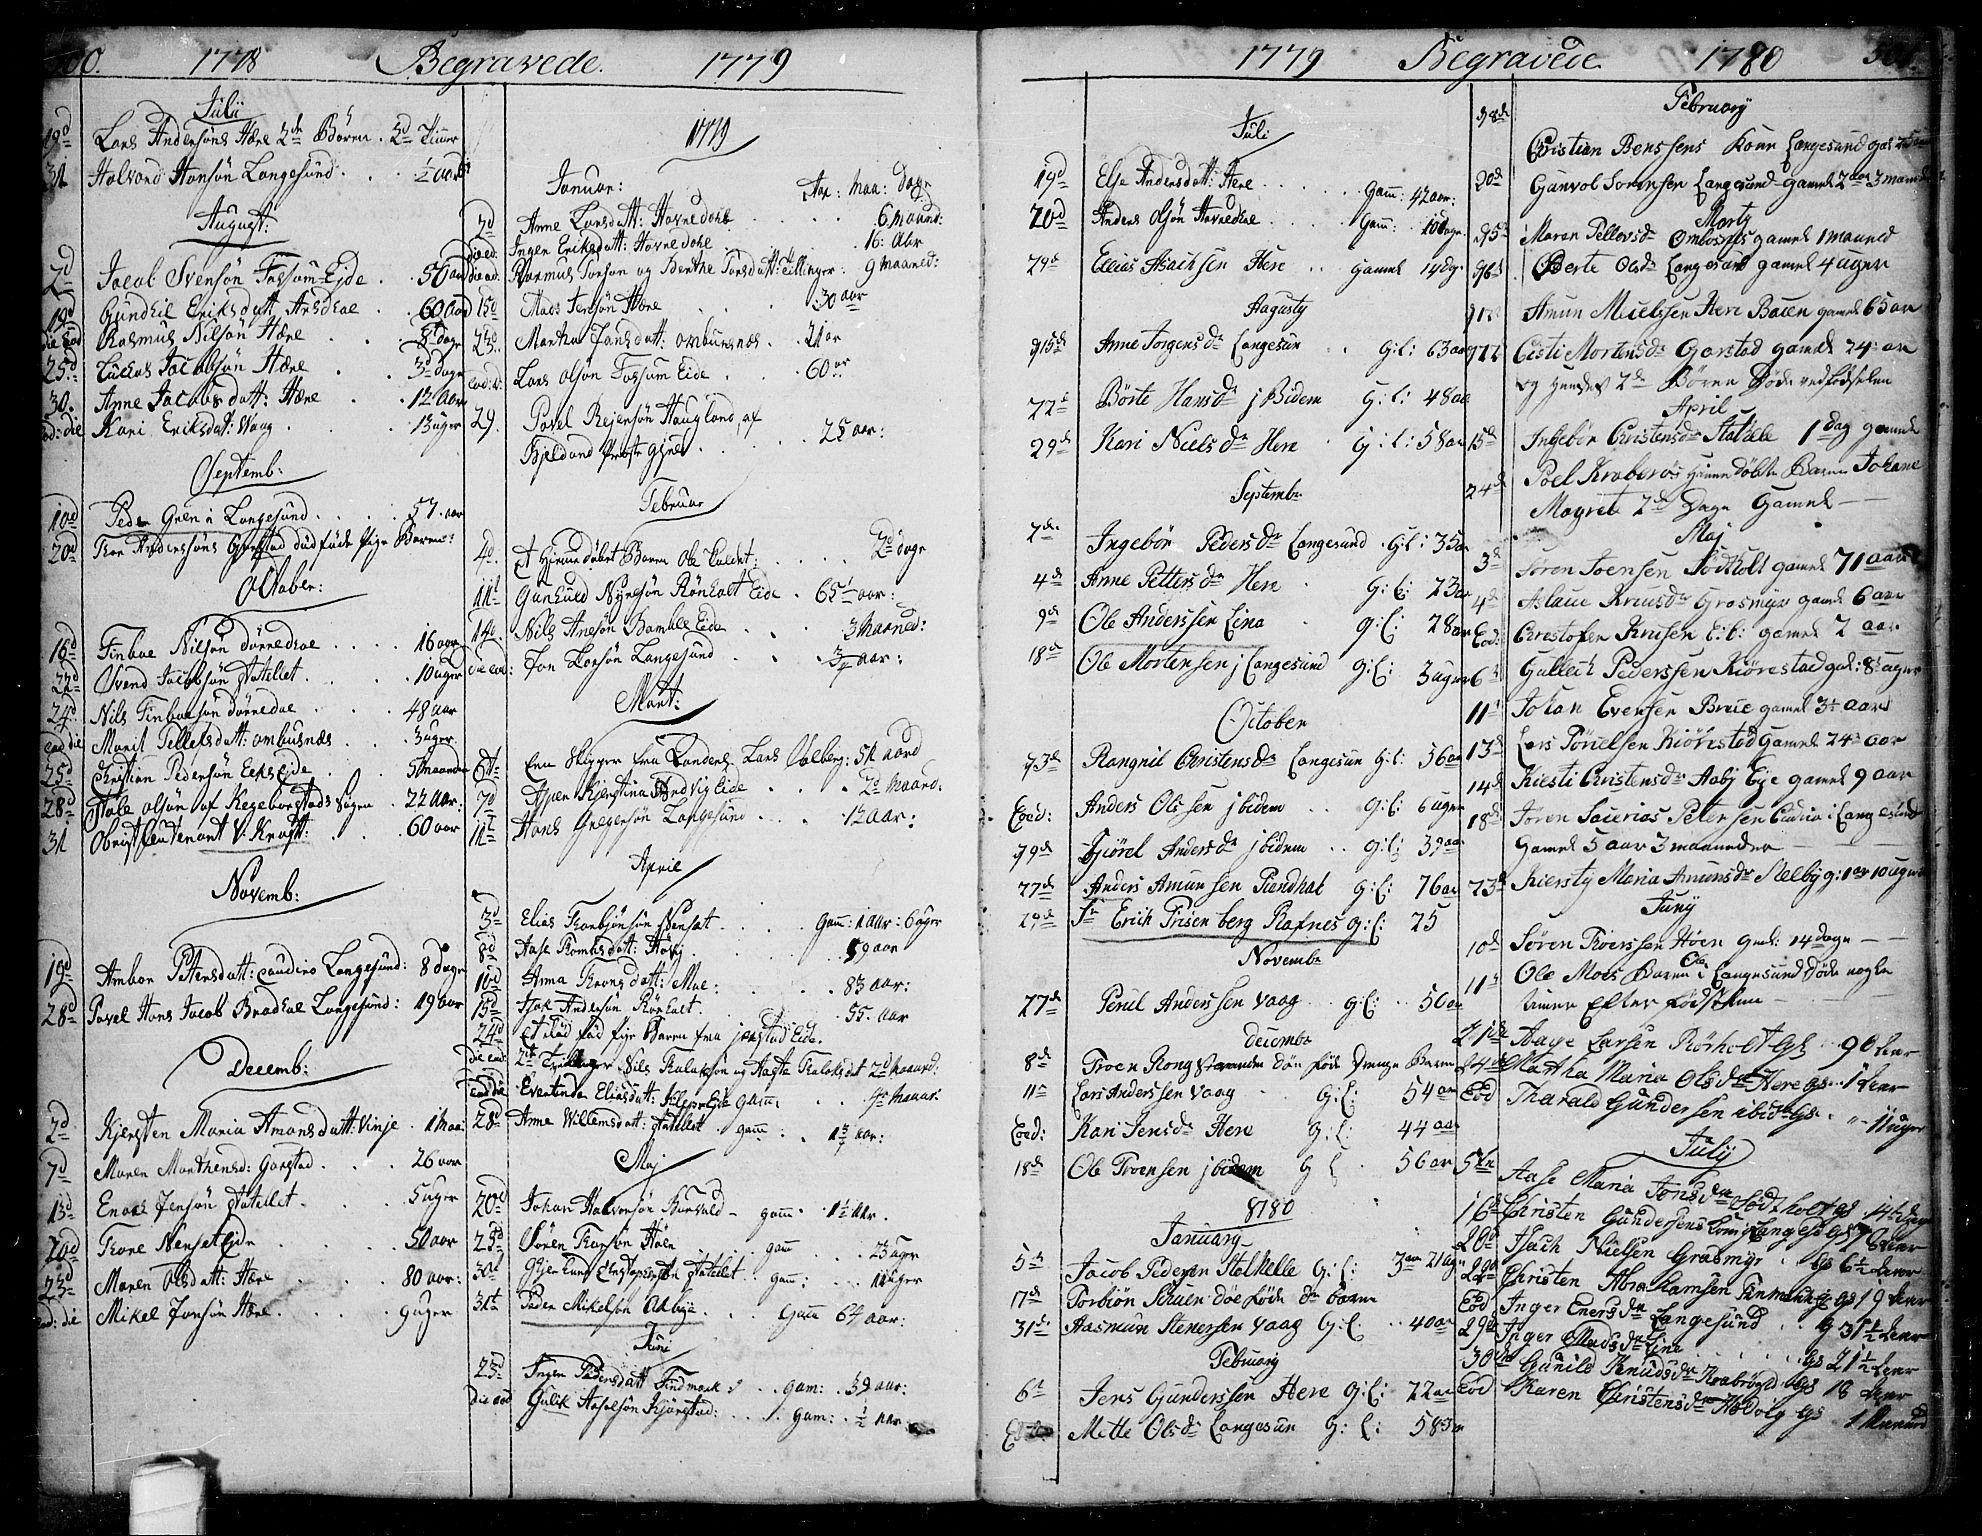 SAKO, Bamble kirkebøker, F/Fa/L0002: Ministerialbok nr. I 2, 1775-1814, s. 500-501